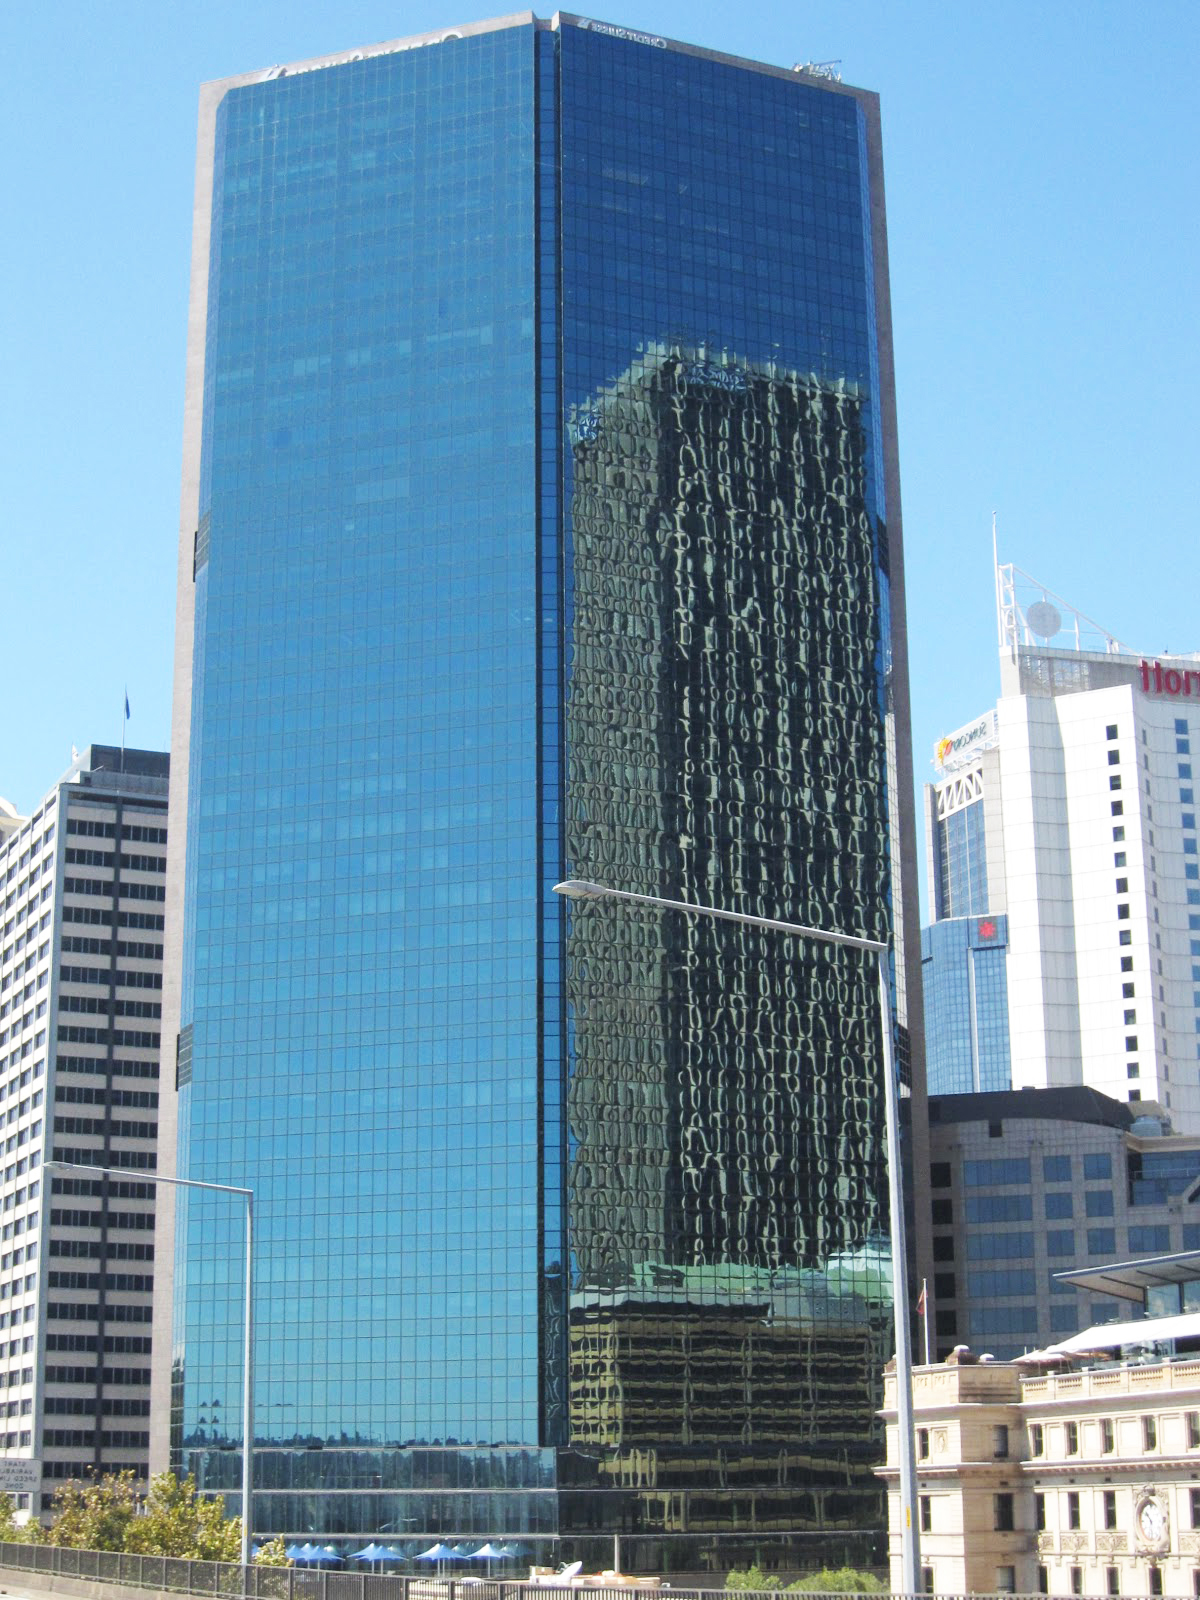 2%2f27%2fthe gateway building